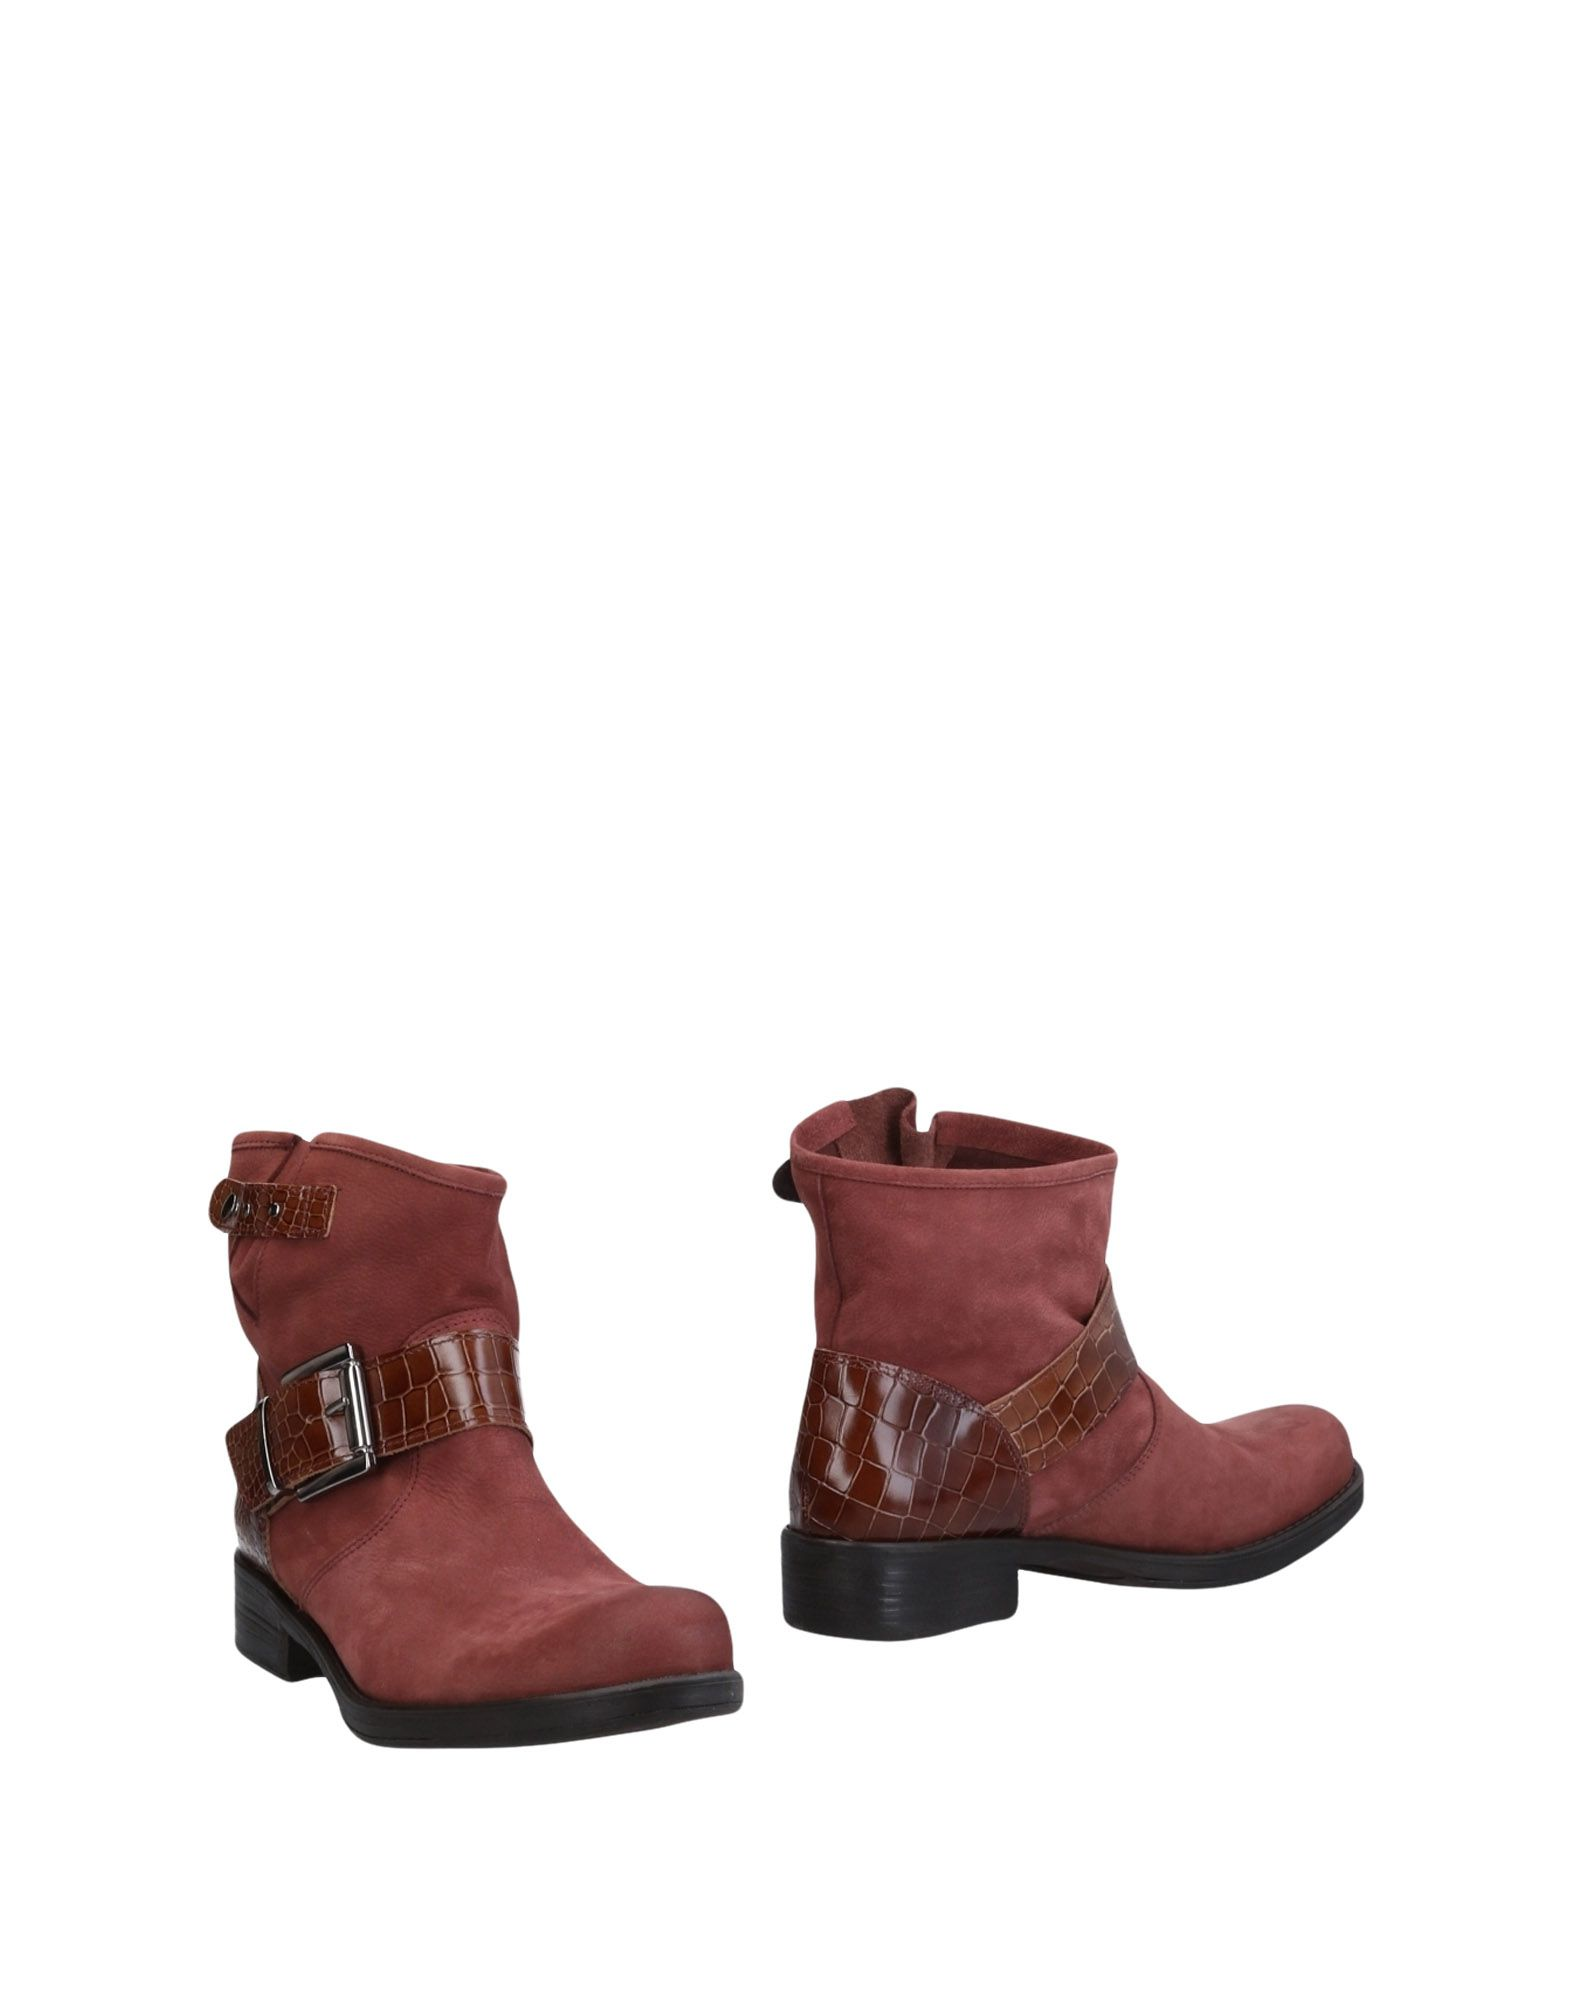 Tsd12 Gute Stiefelette Damen  11453979SI Gute Tsd12 Qualität beliebte Schuhe 925fb1